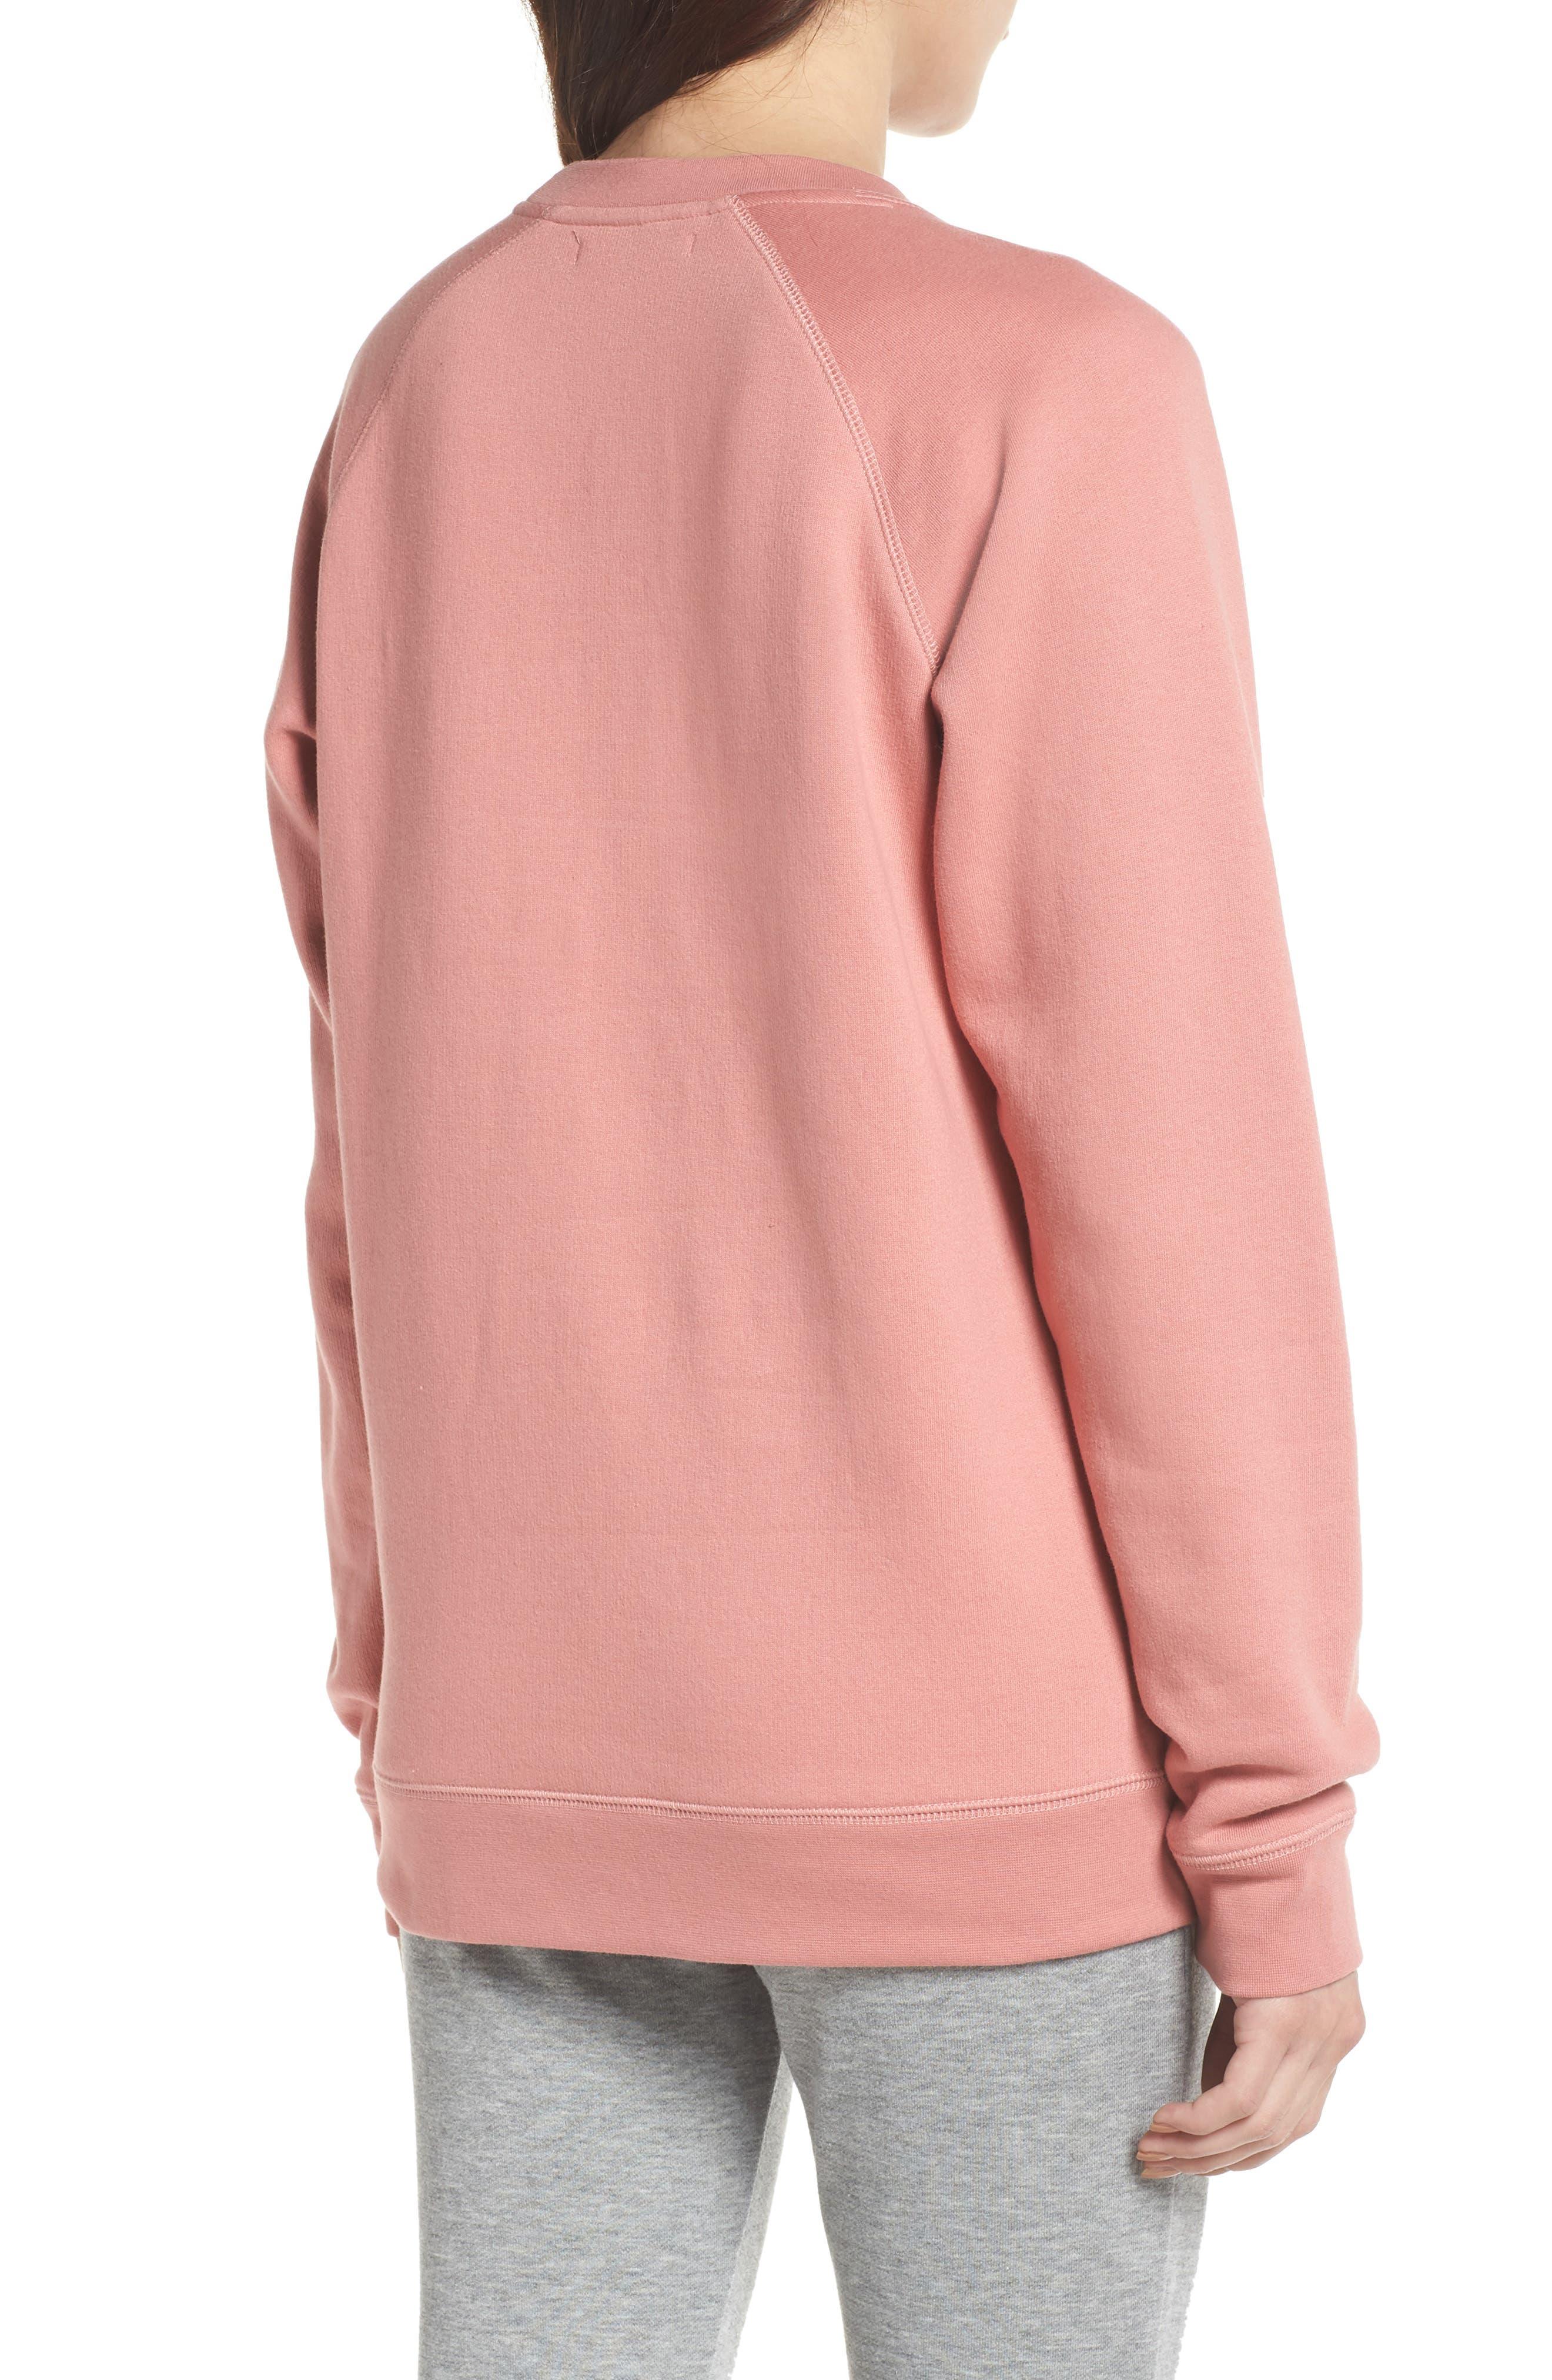 Babes Who Brunch Sweatshirt,                             Alternate thumbnail 2, color,                             955